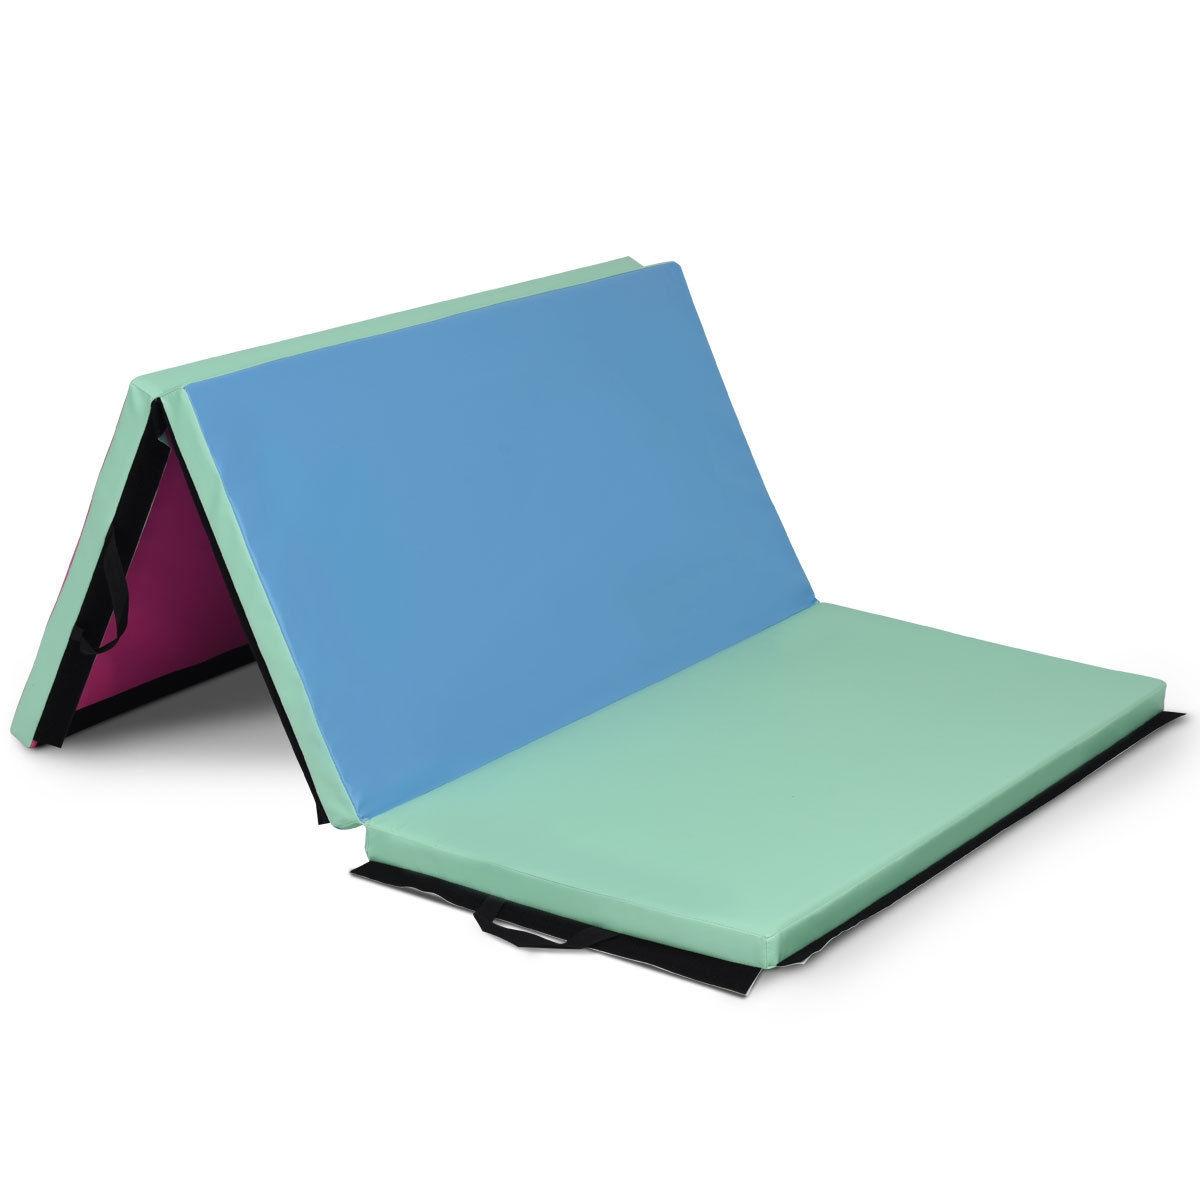 4' x 6' x 2' Portable PU Exercise Aerobics Gymnastic Mat